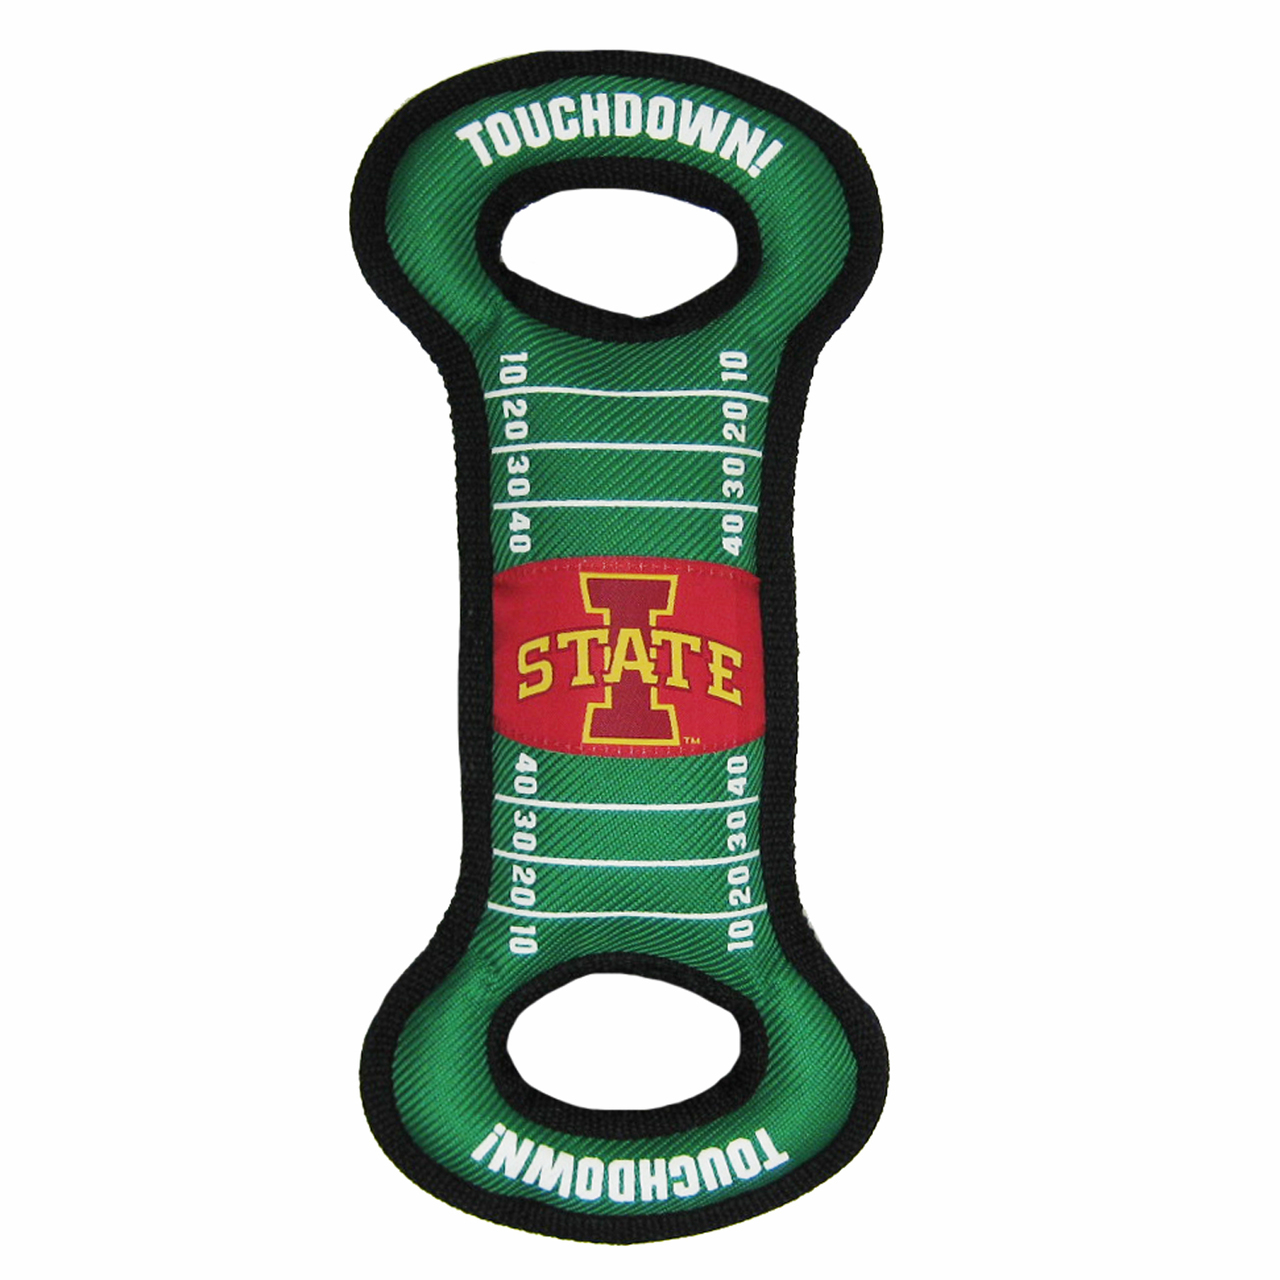 Hot Dog Iowa State Football NCAA Field Tug Dog Toy